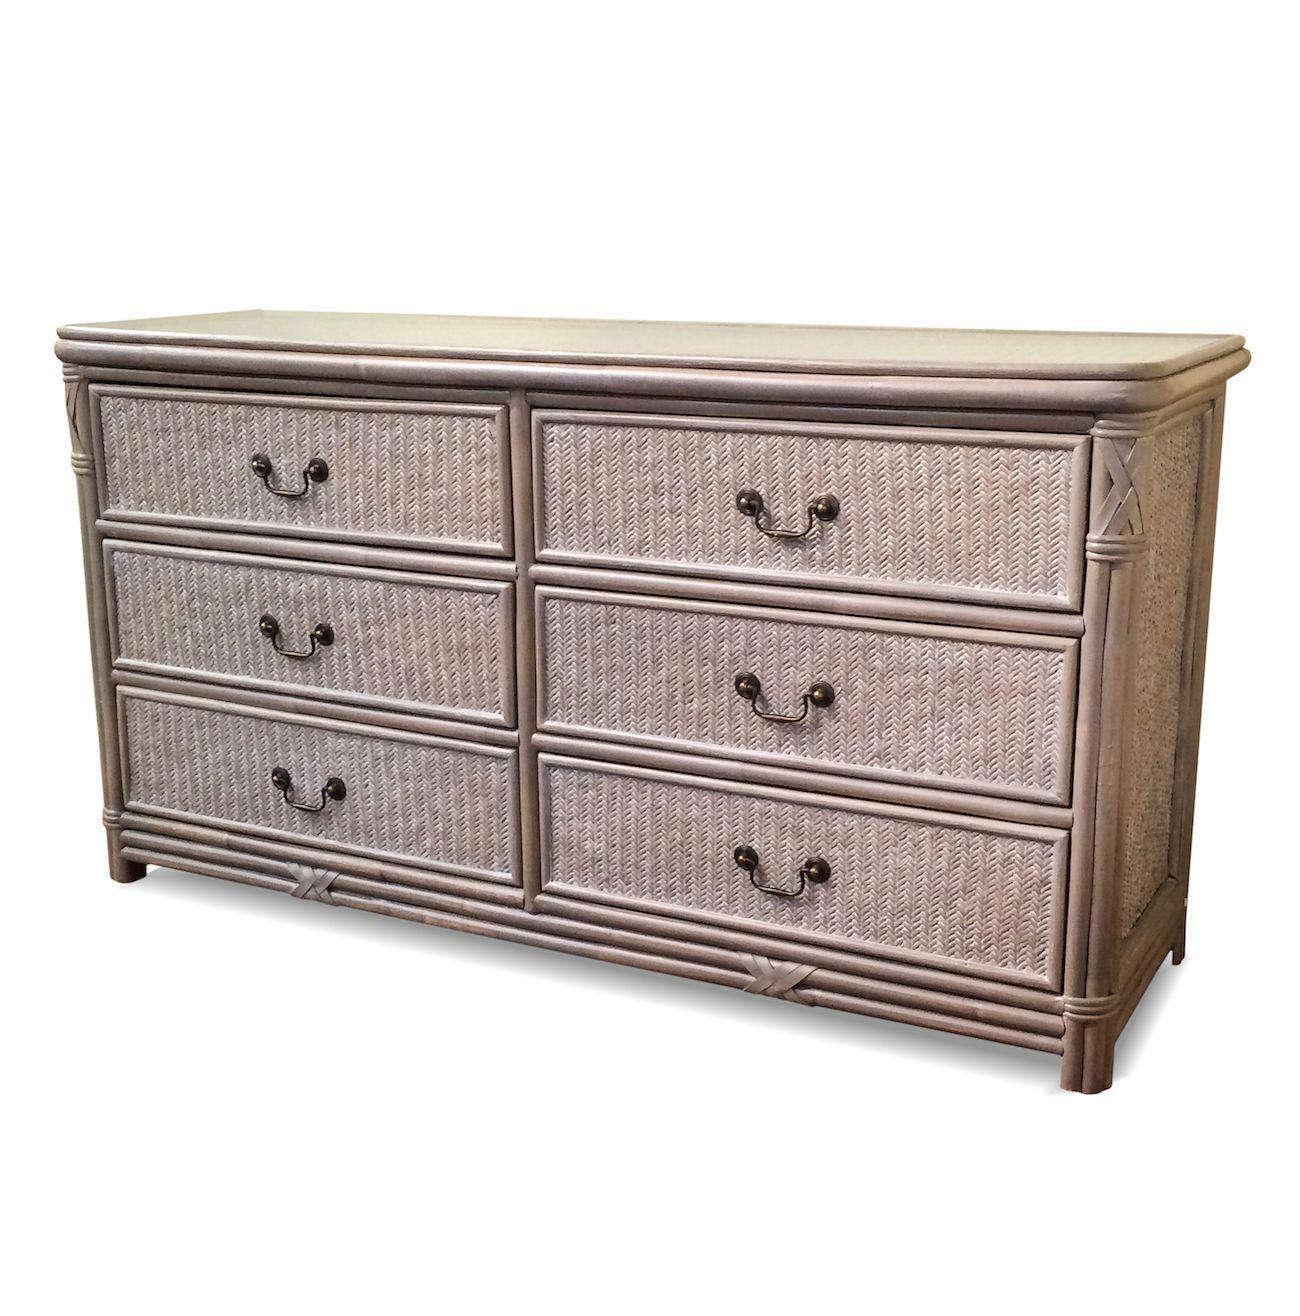 Undefined 6 Drawer Dresser Wicker Bedroom Furniture Nyc Furniture [ 1316 x 1300 Pixel ]